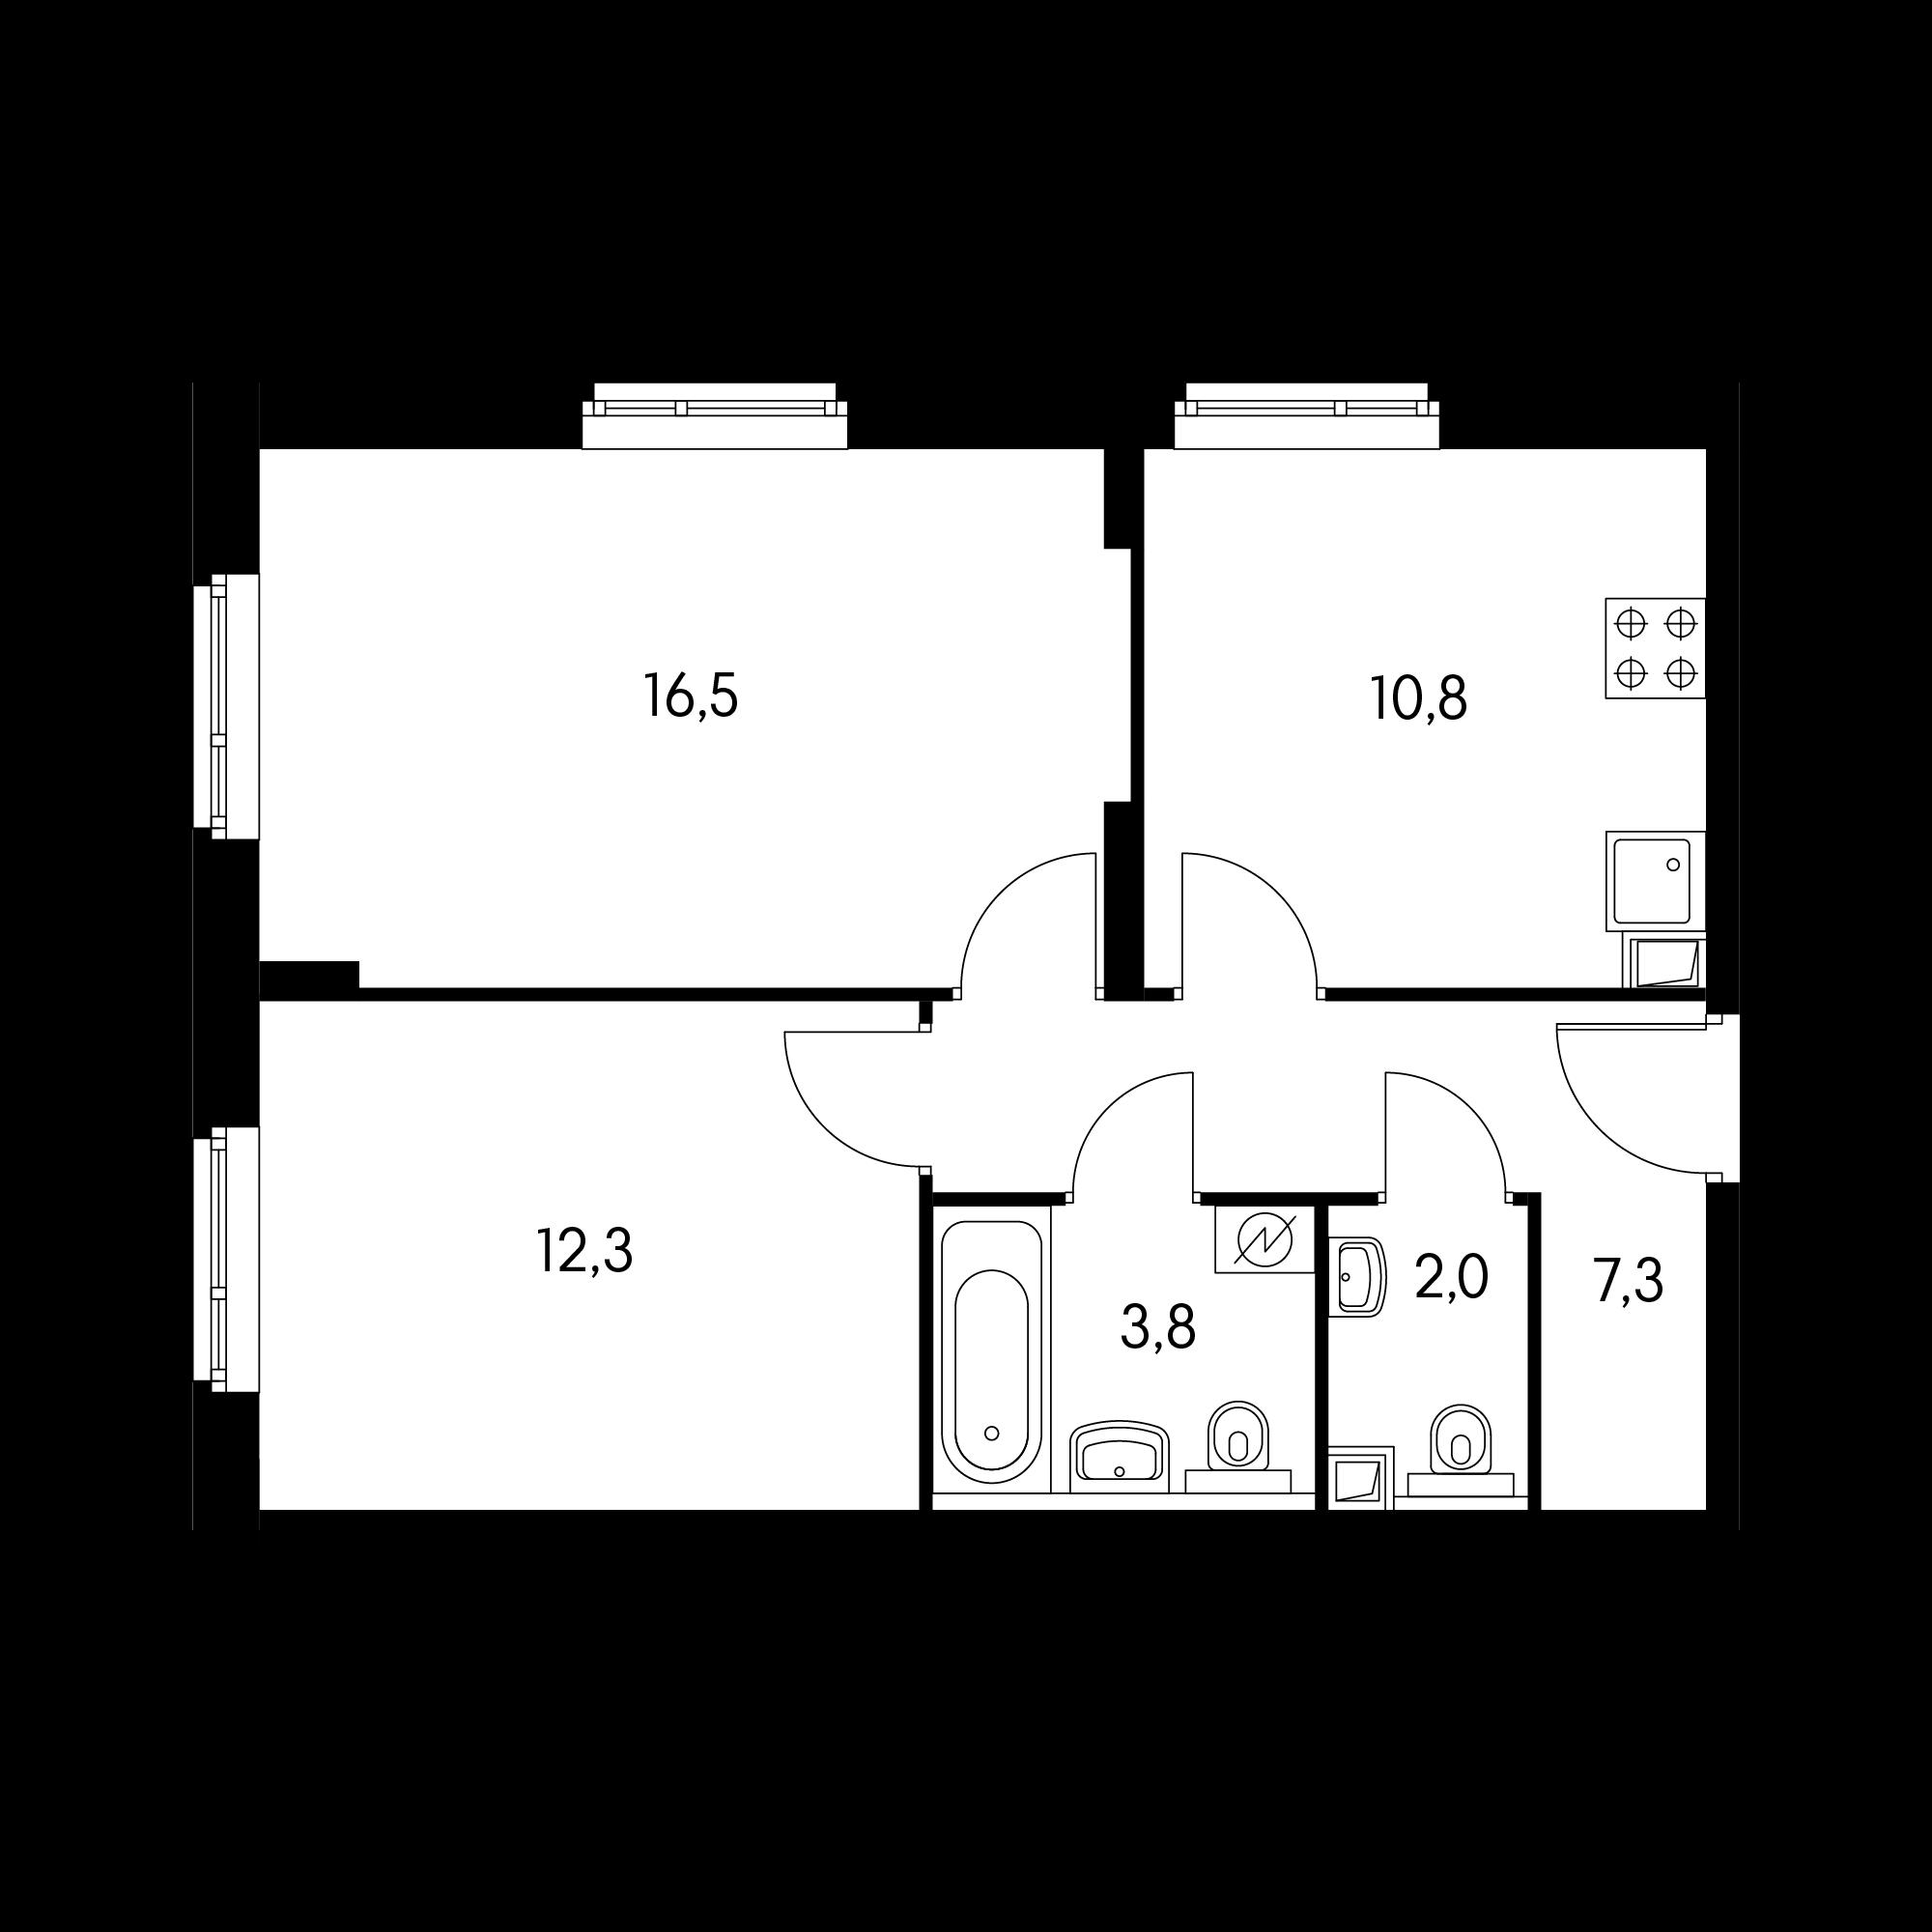 2KM8_12